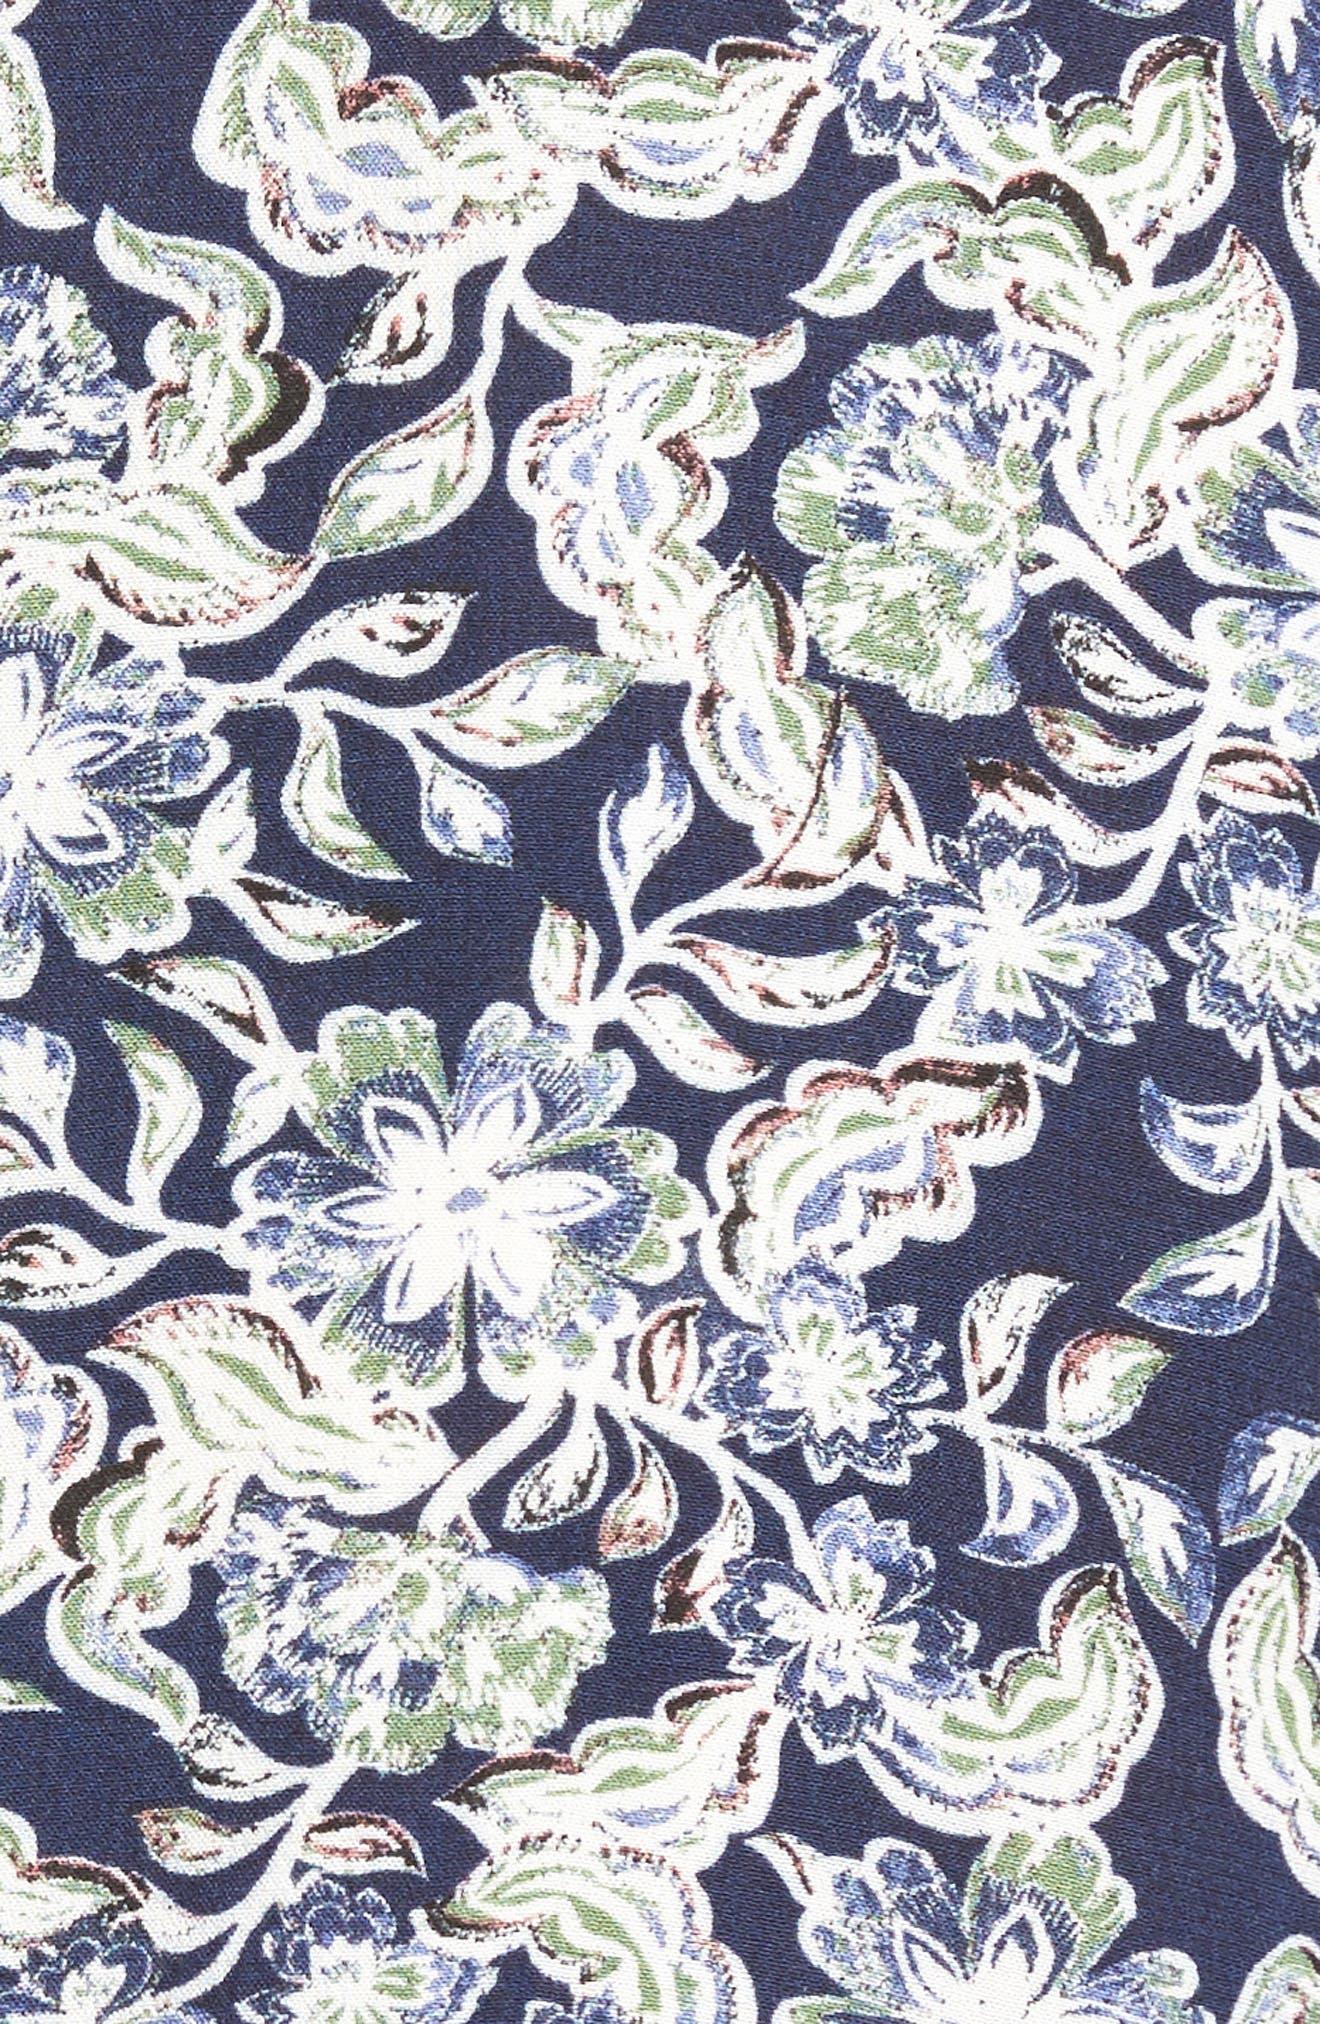 Shift Minidress,                             Alternate thumbnail 5, color,                             Navy Peacoat Snap Floral